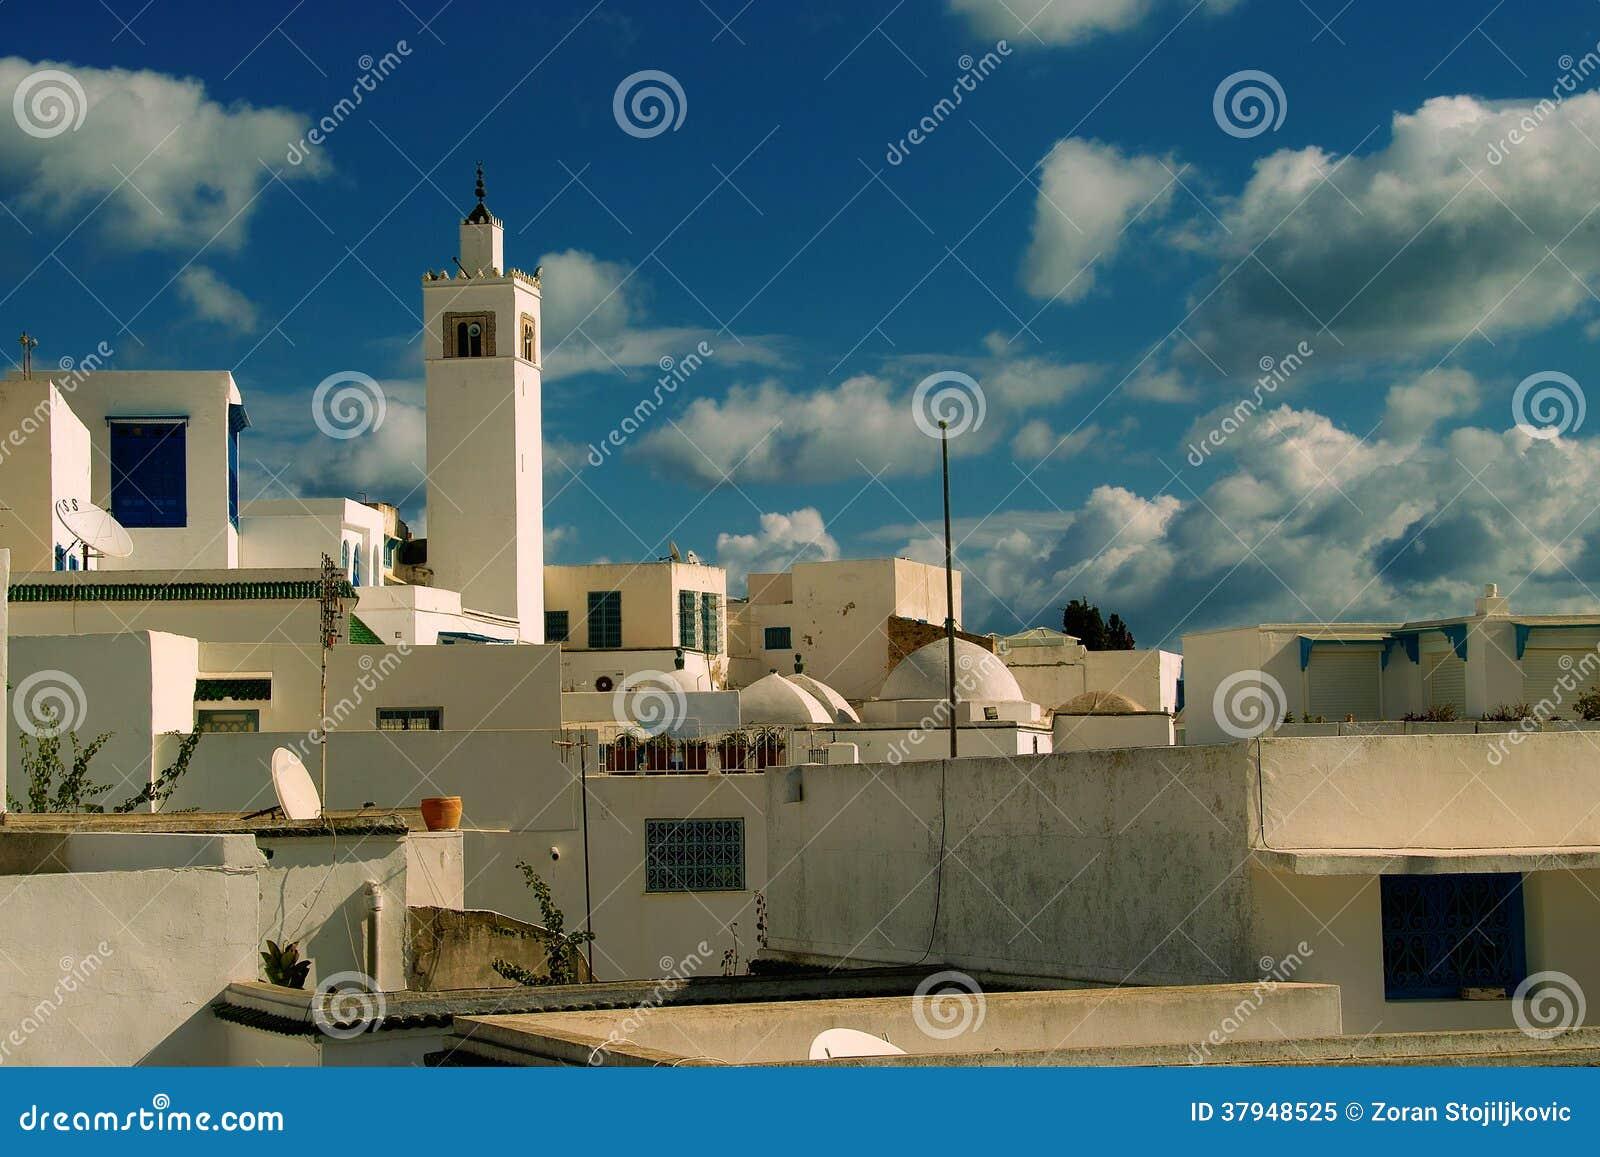 Sidi bou Said/blue and white village